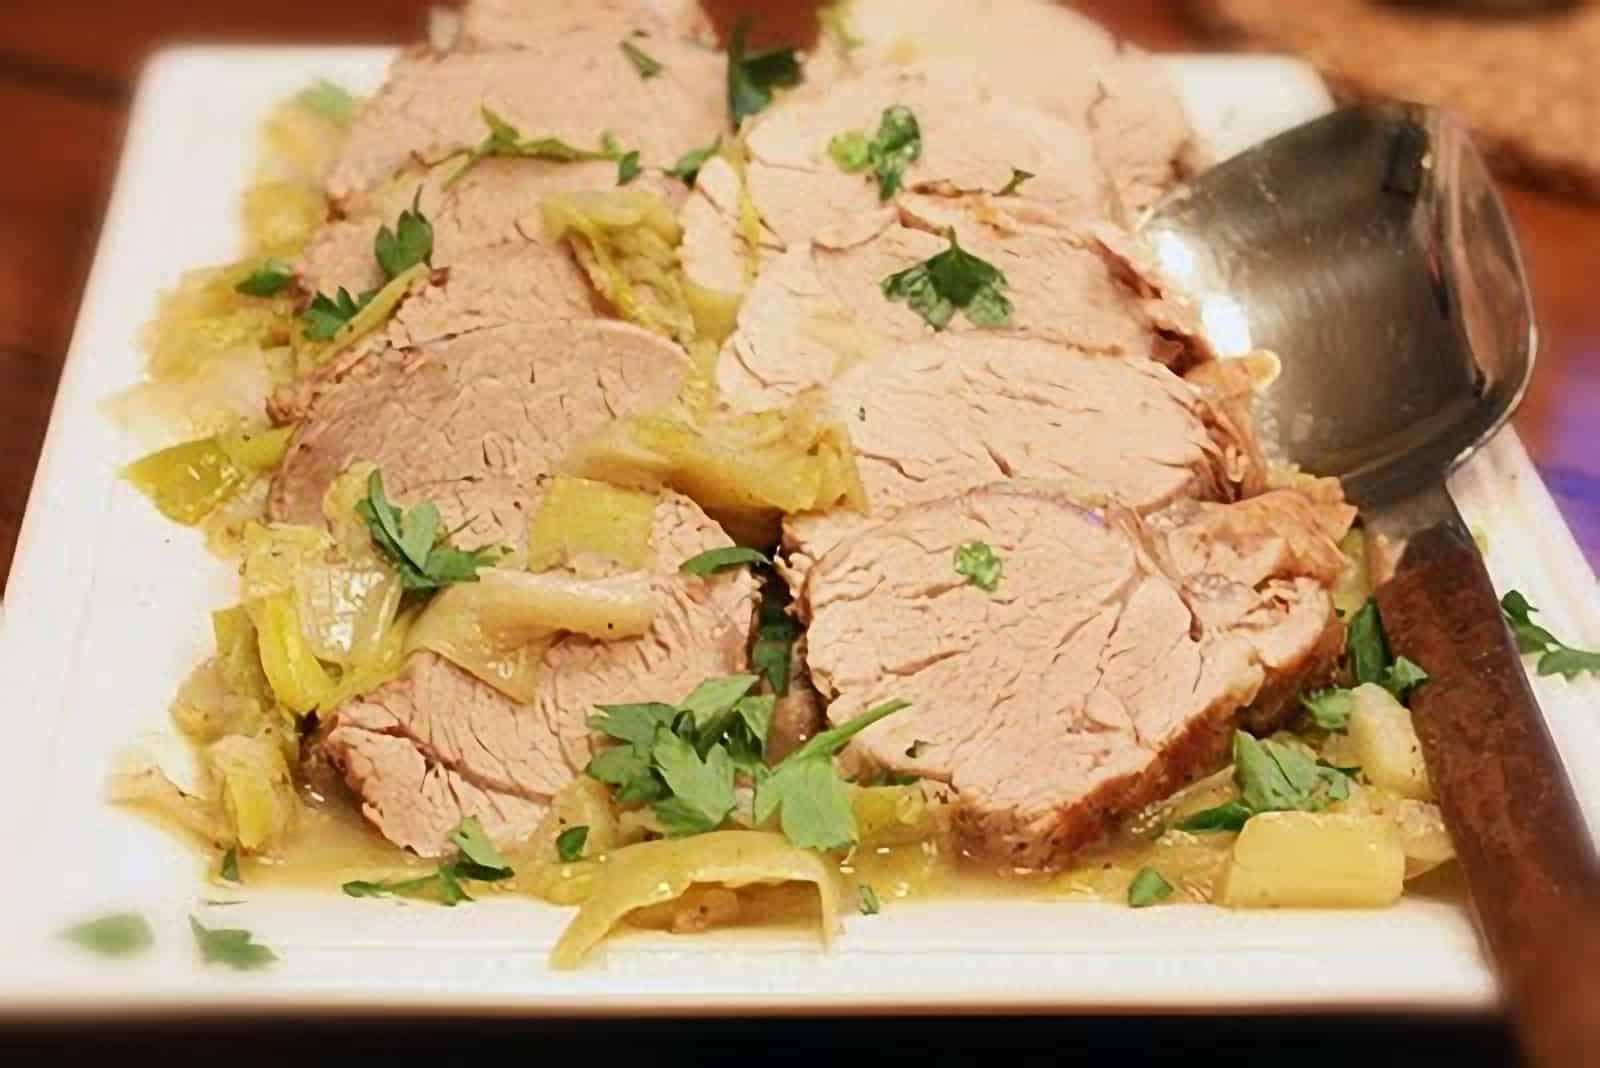 Pork Tenderloin with Leeks and Tarragon